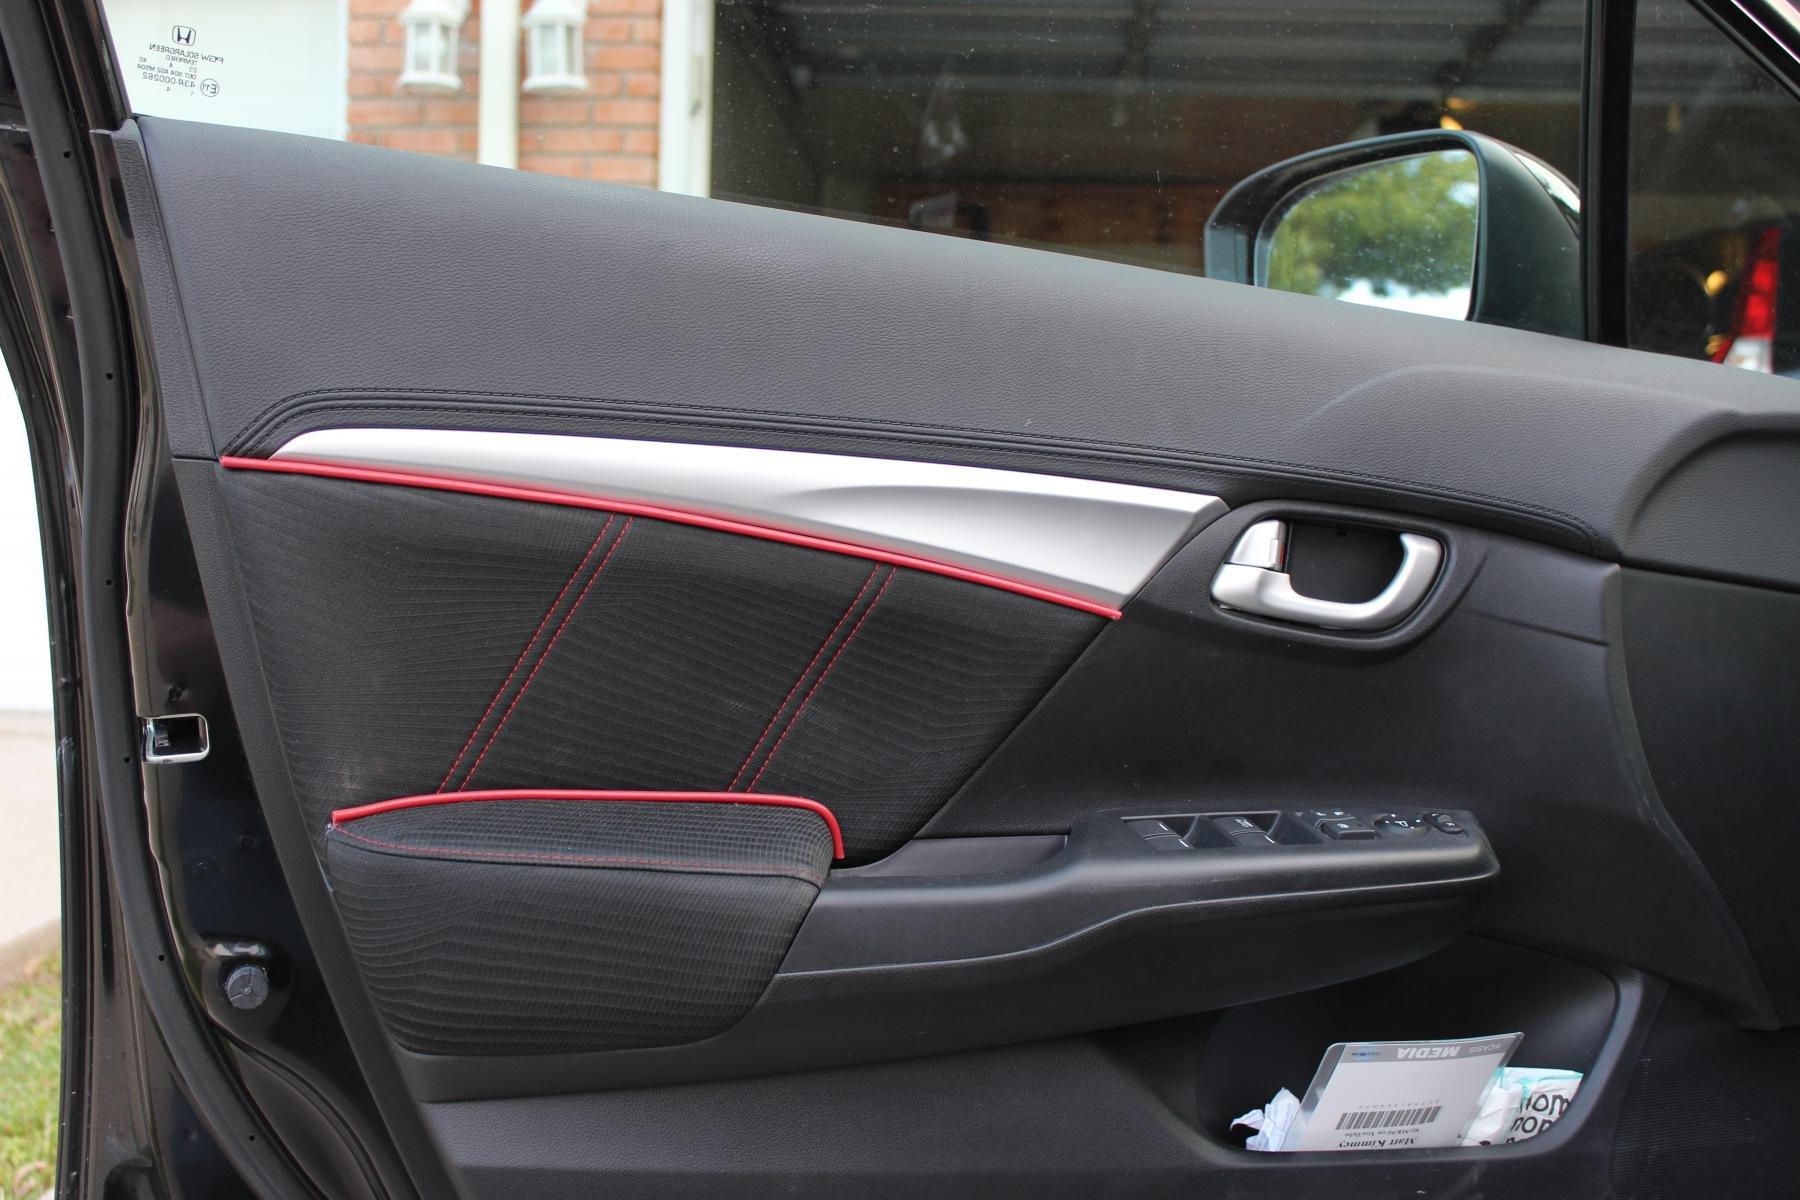 Car interior piping - Interior Door Piping Welt Trimming Img_6248 Jpg